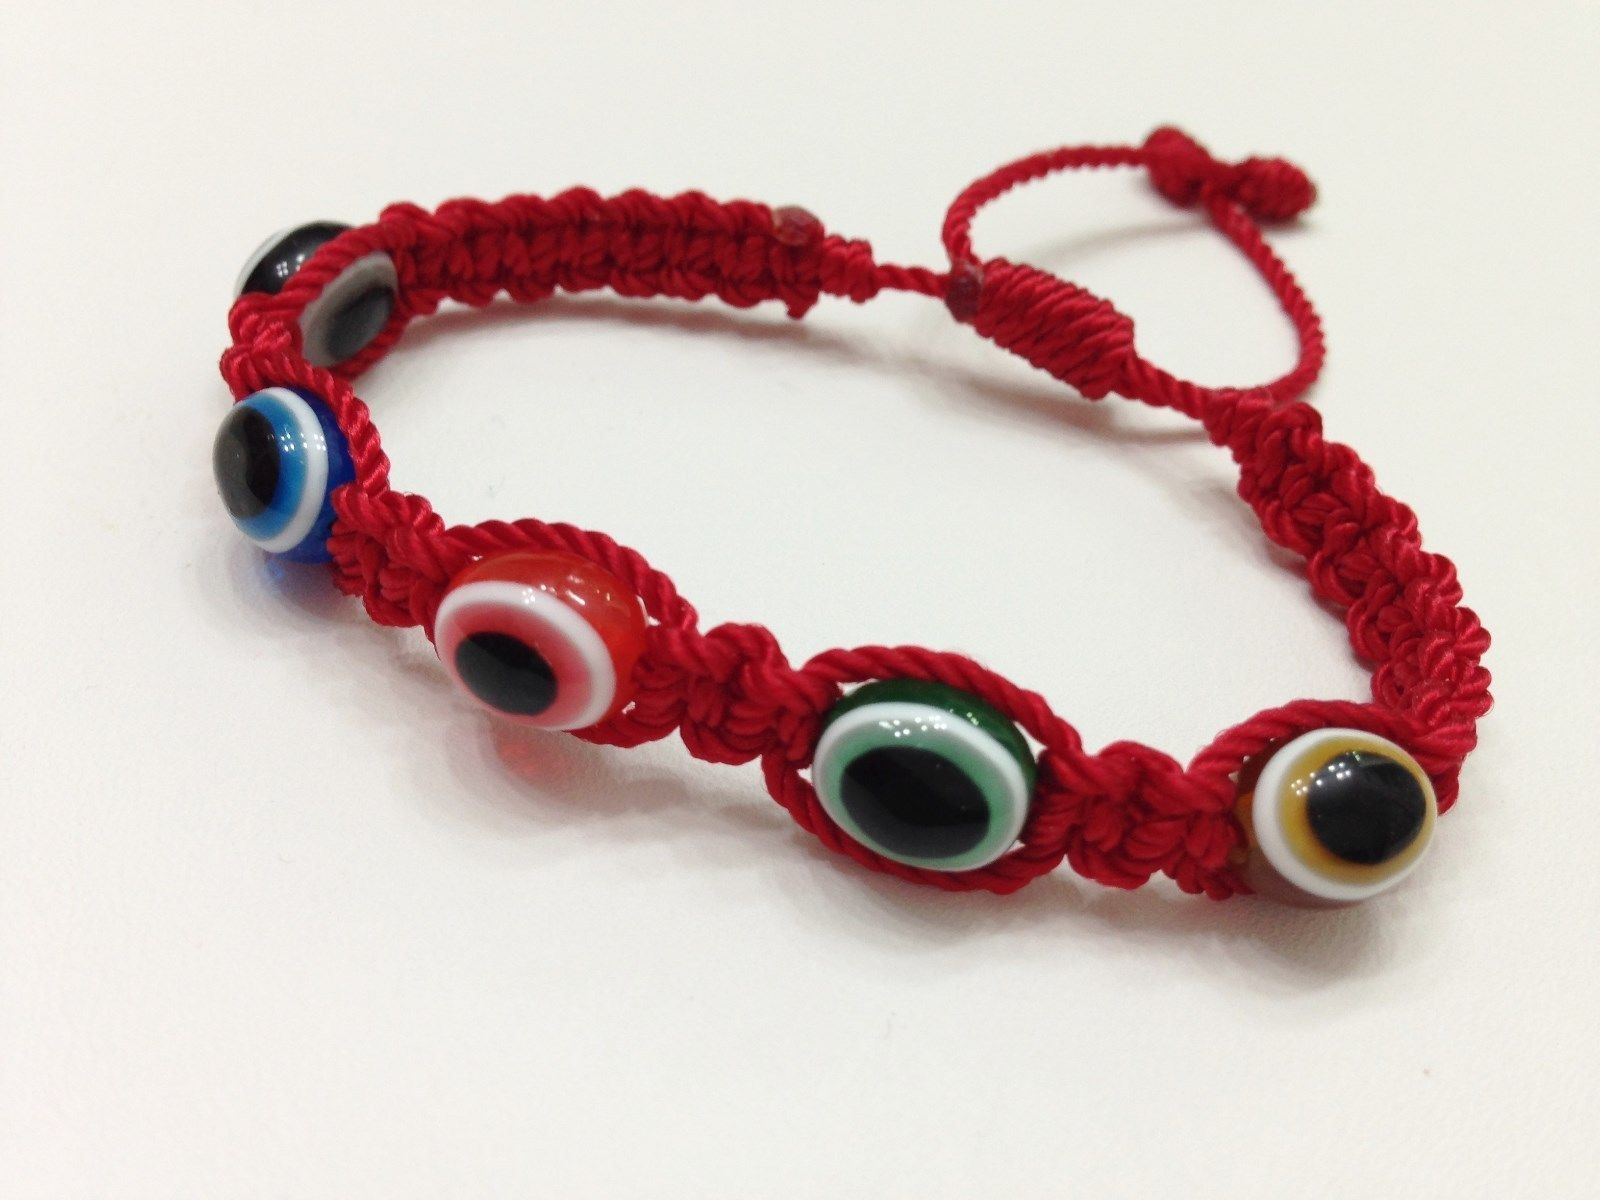 Evil Eye Bracelet Pulsera Roja Para El Mal De Ojo Potente Amuleto Hecha A Mano Woven Handmade Crafts